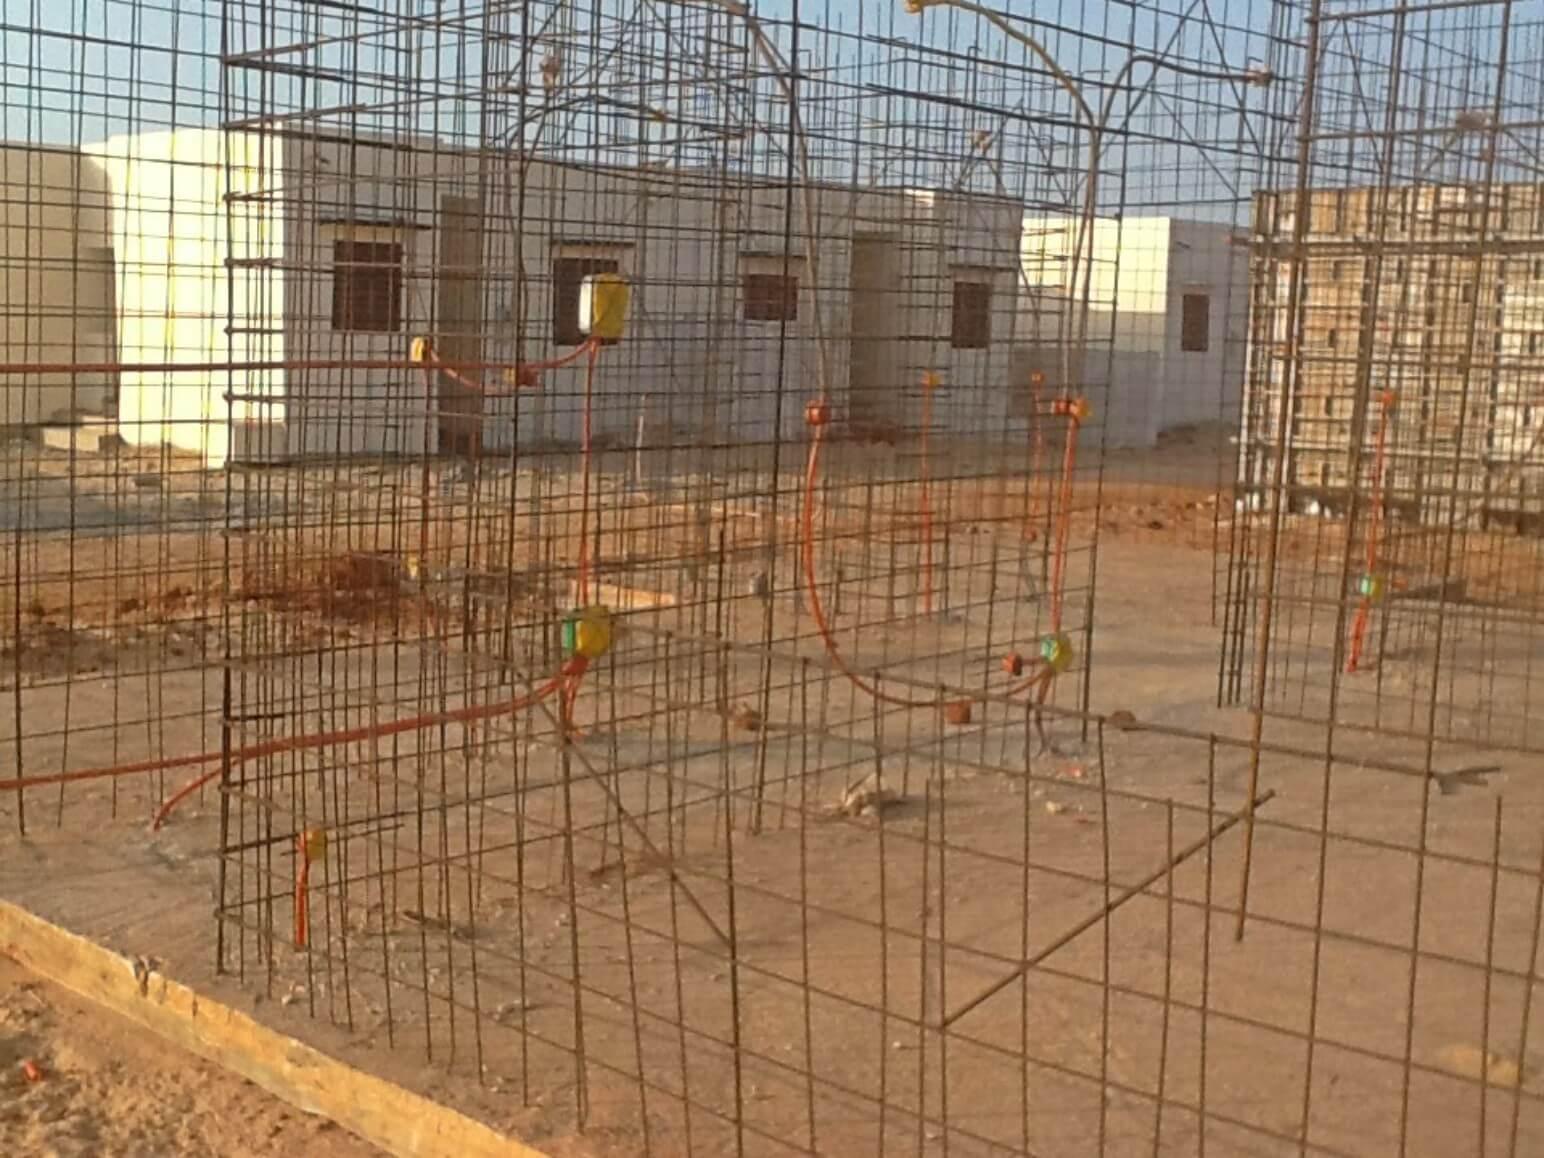 proyecto senegal encofrados de aluminio construccion strong forms alicante 10